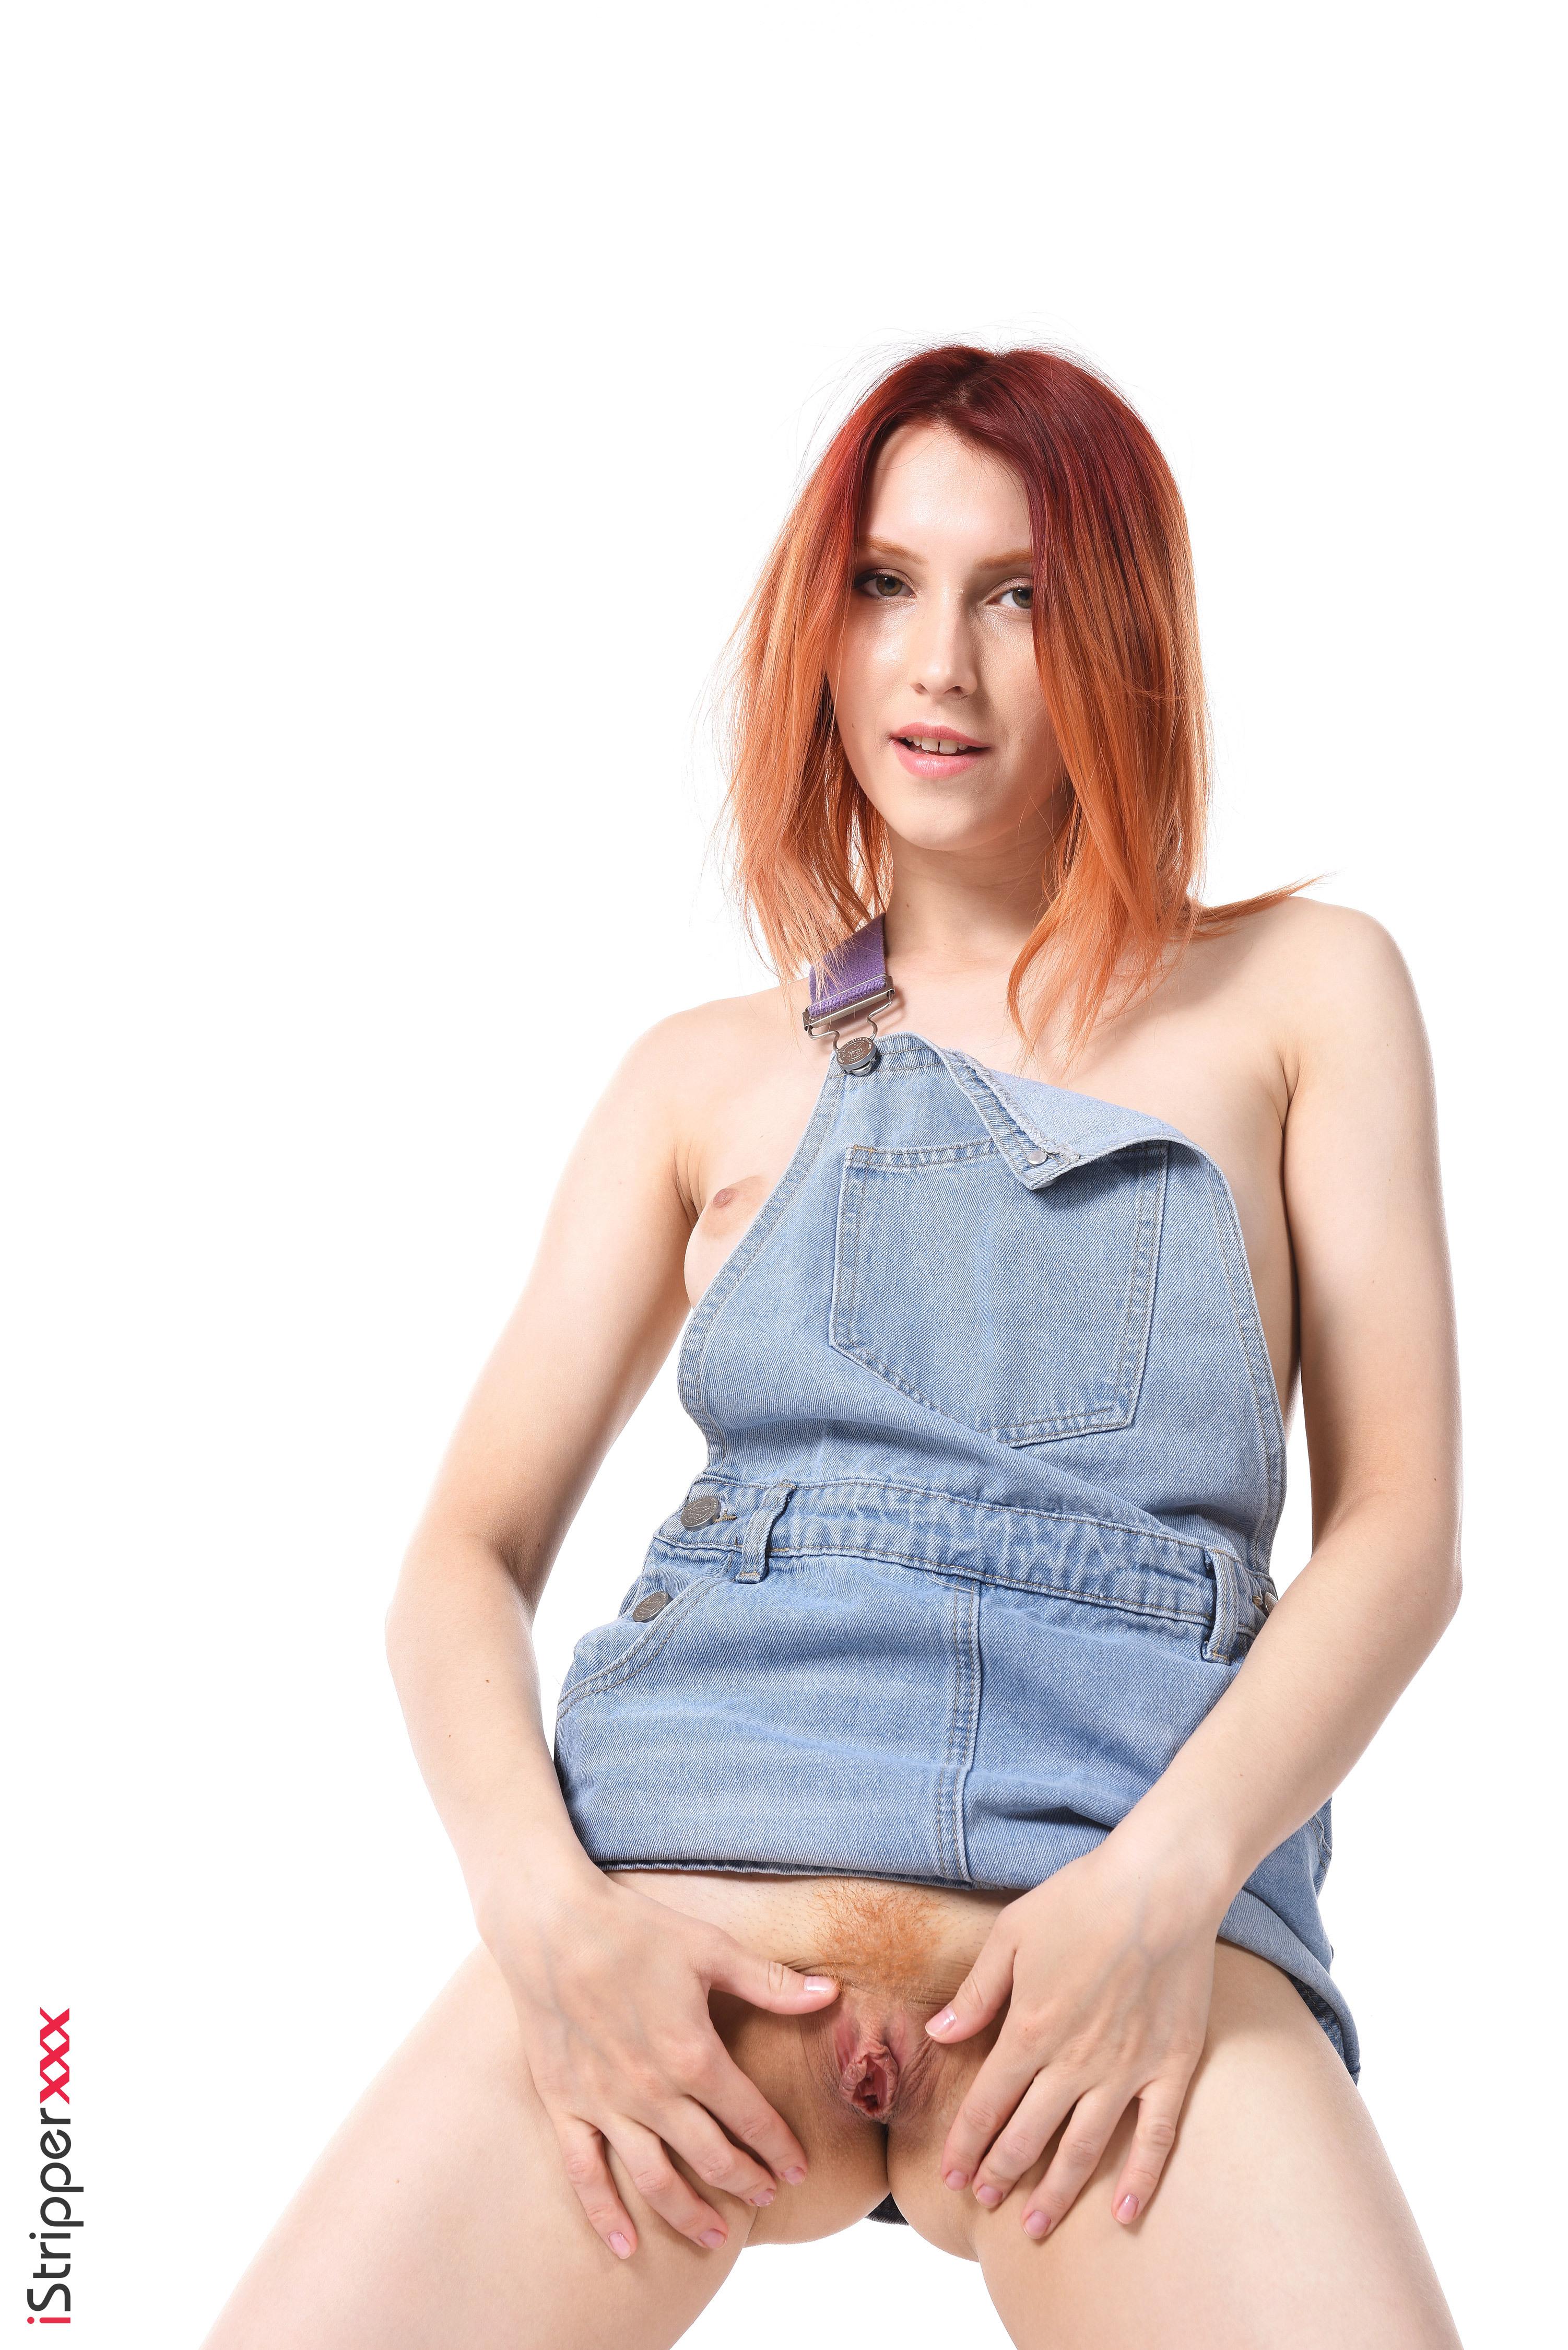 hot Huge boobed Latina ladies tittied Preggo beauties sexy lingerie